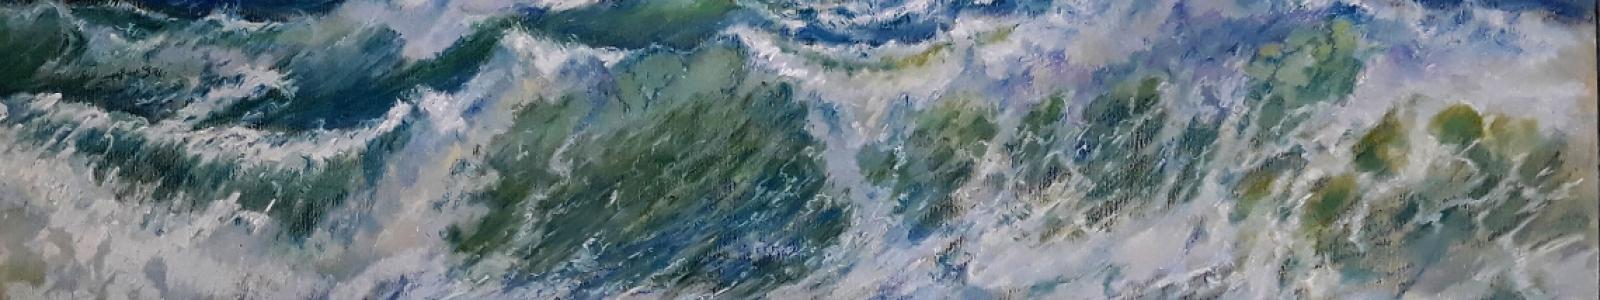 Gallery Painter German Vizulis